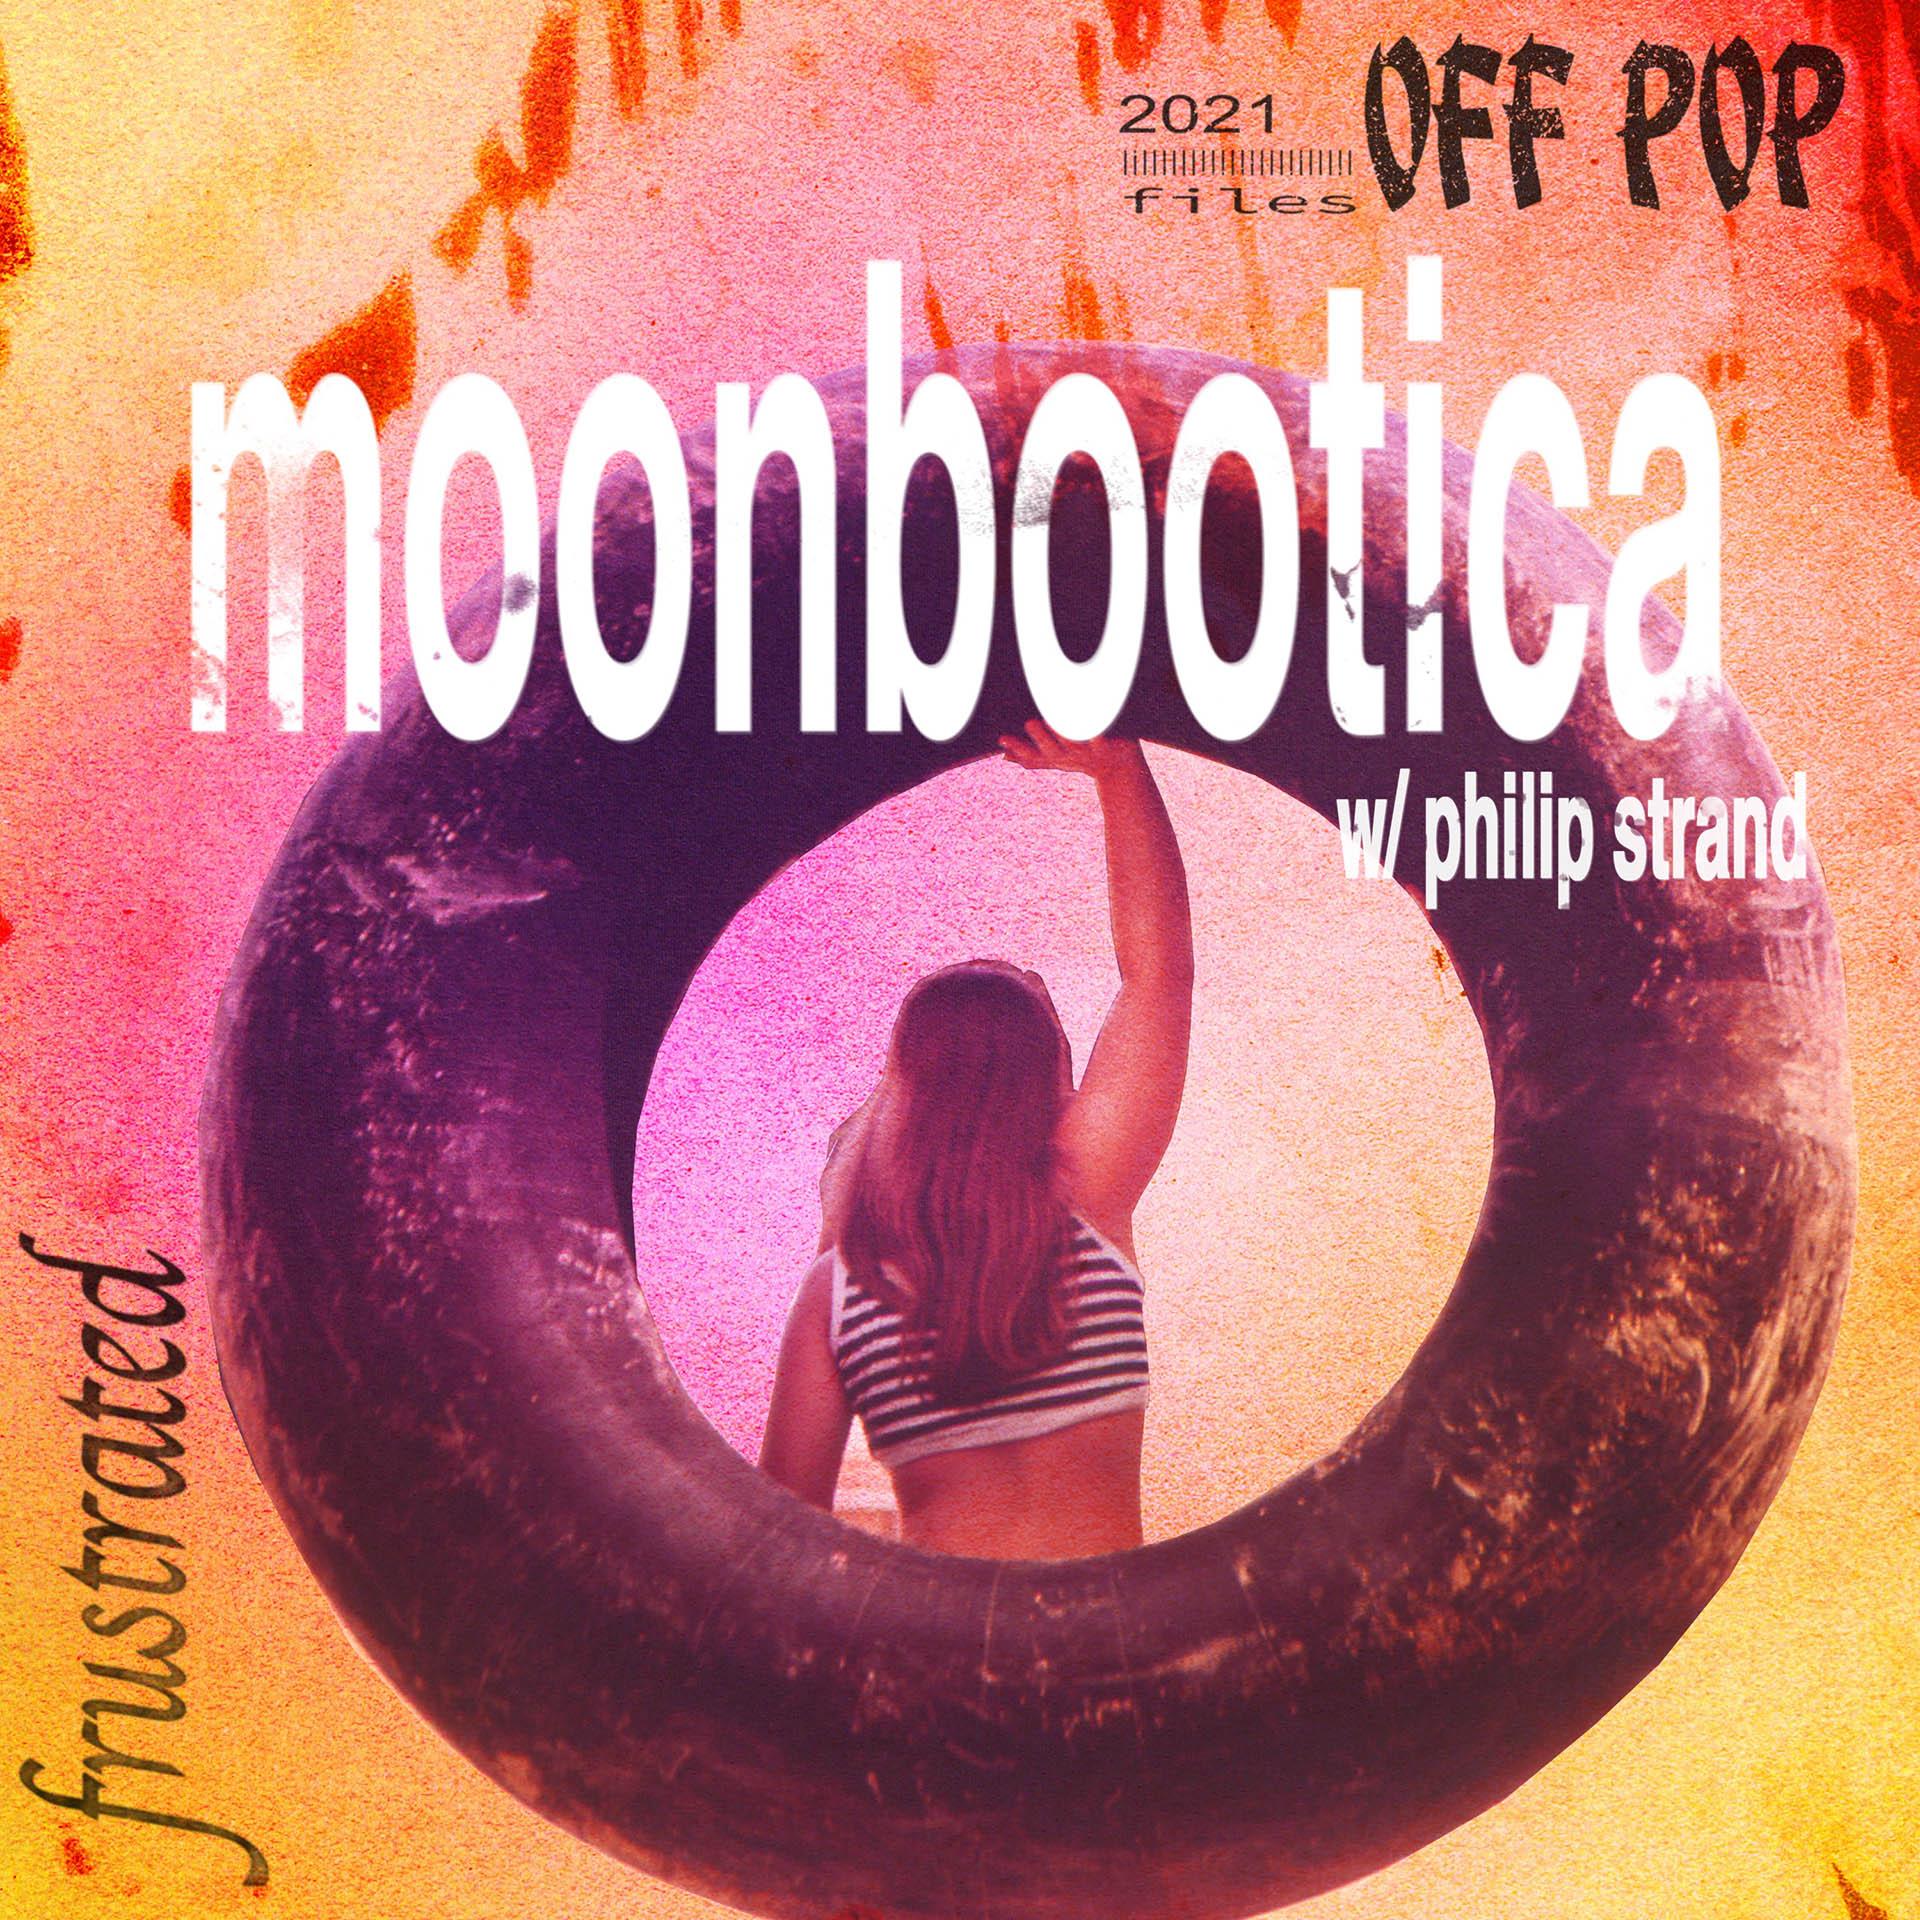 Moonbotica - Frustrated